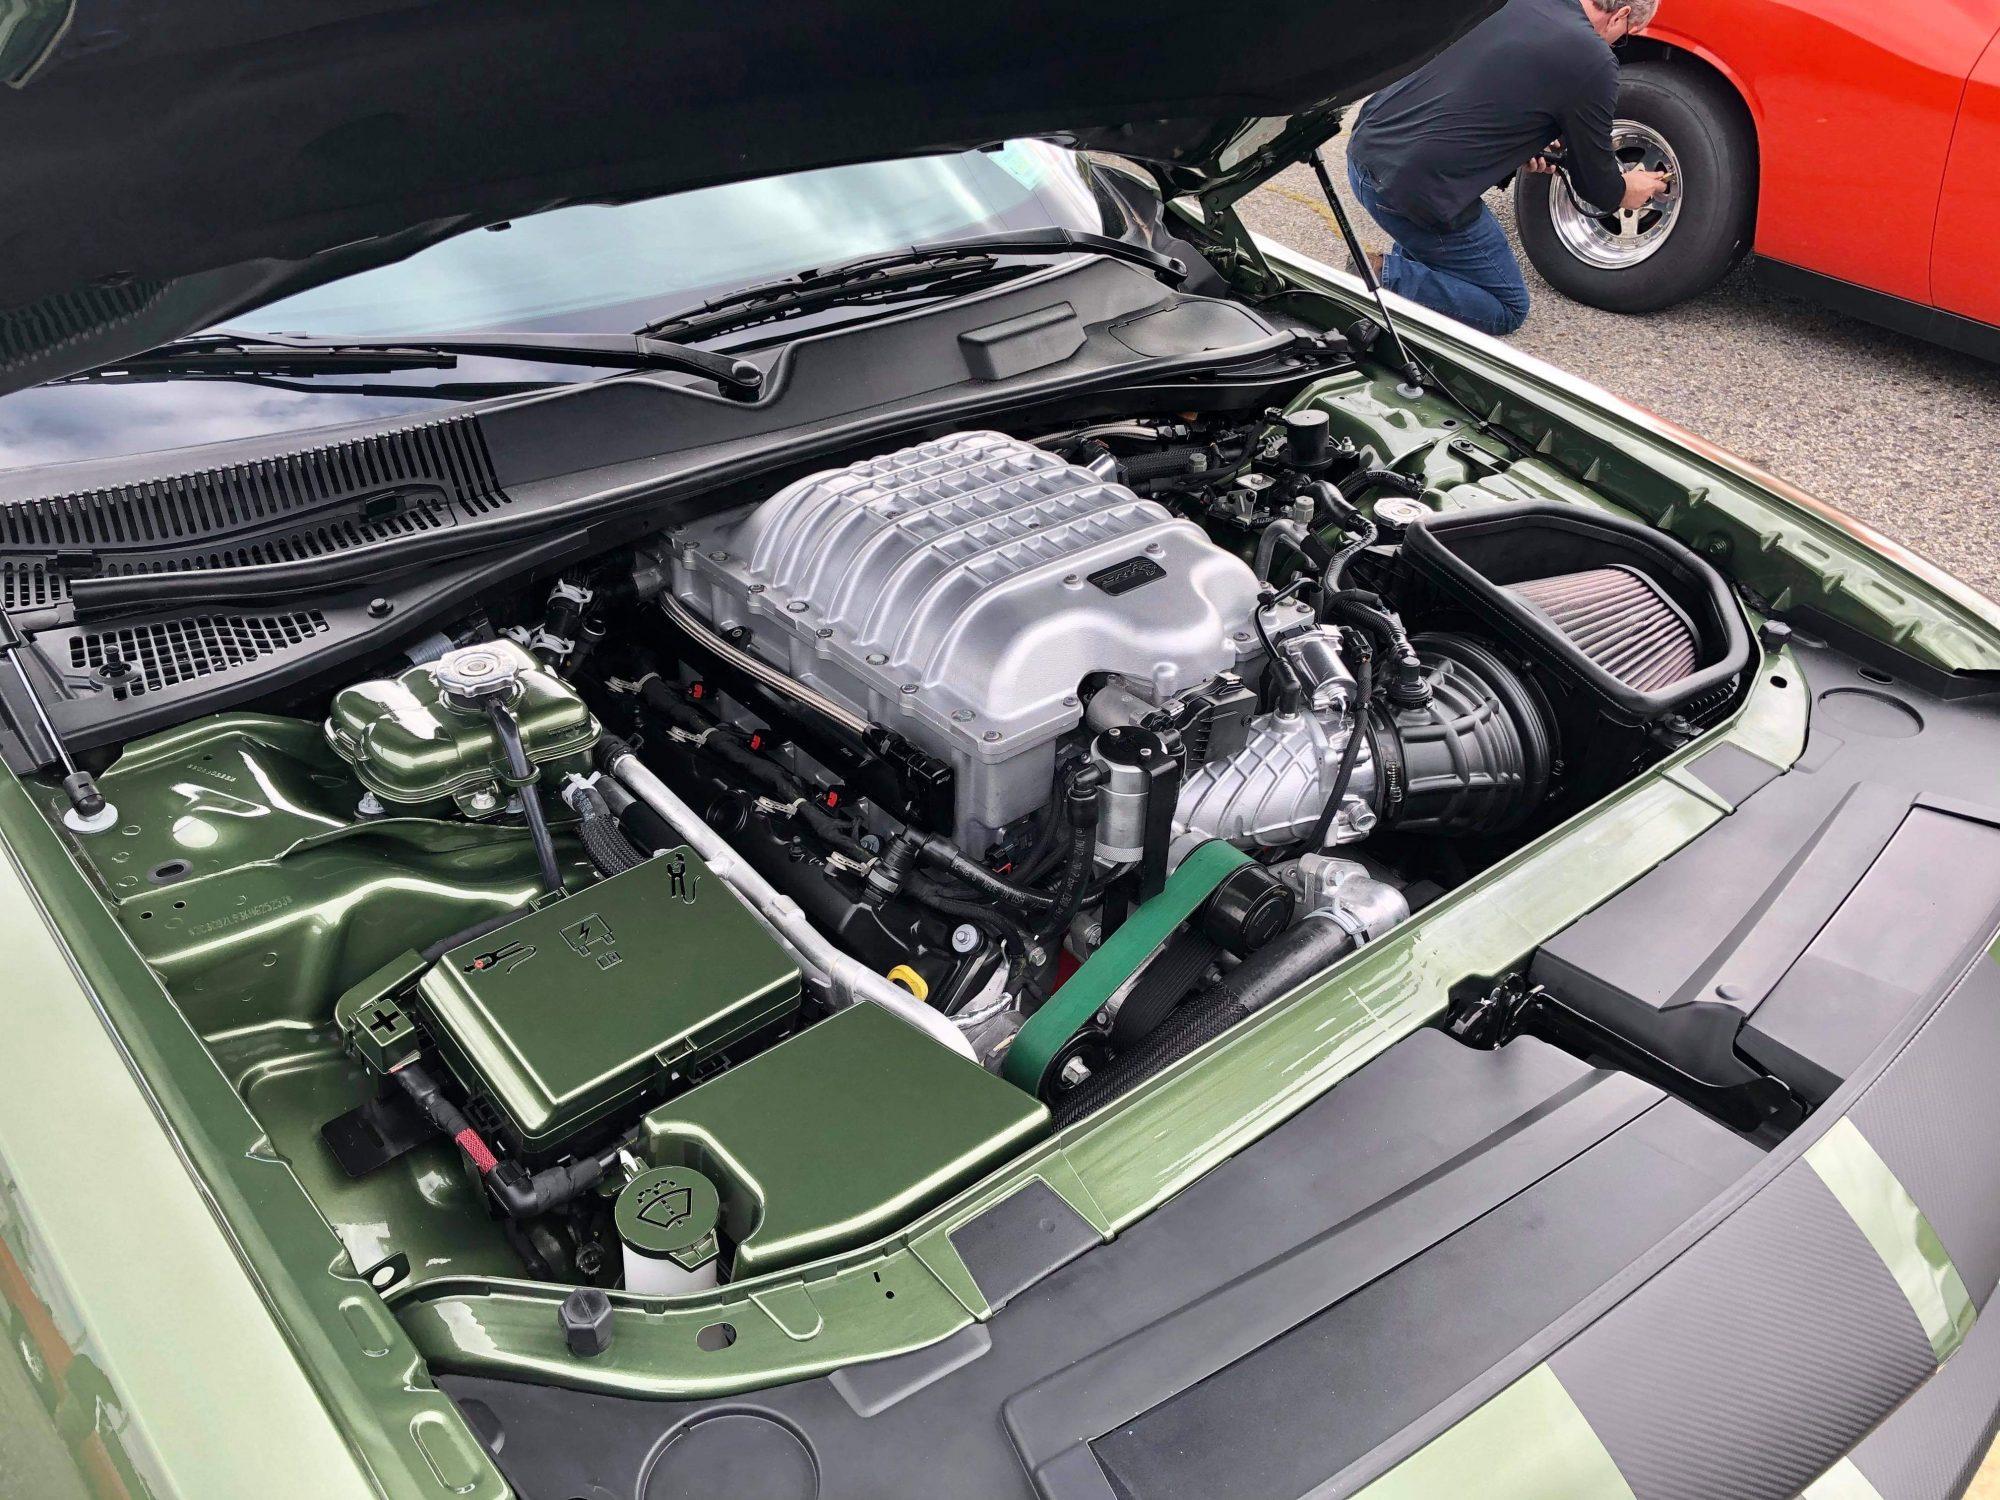 Dodge Challenger SRT Hellcat Redeye engine